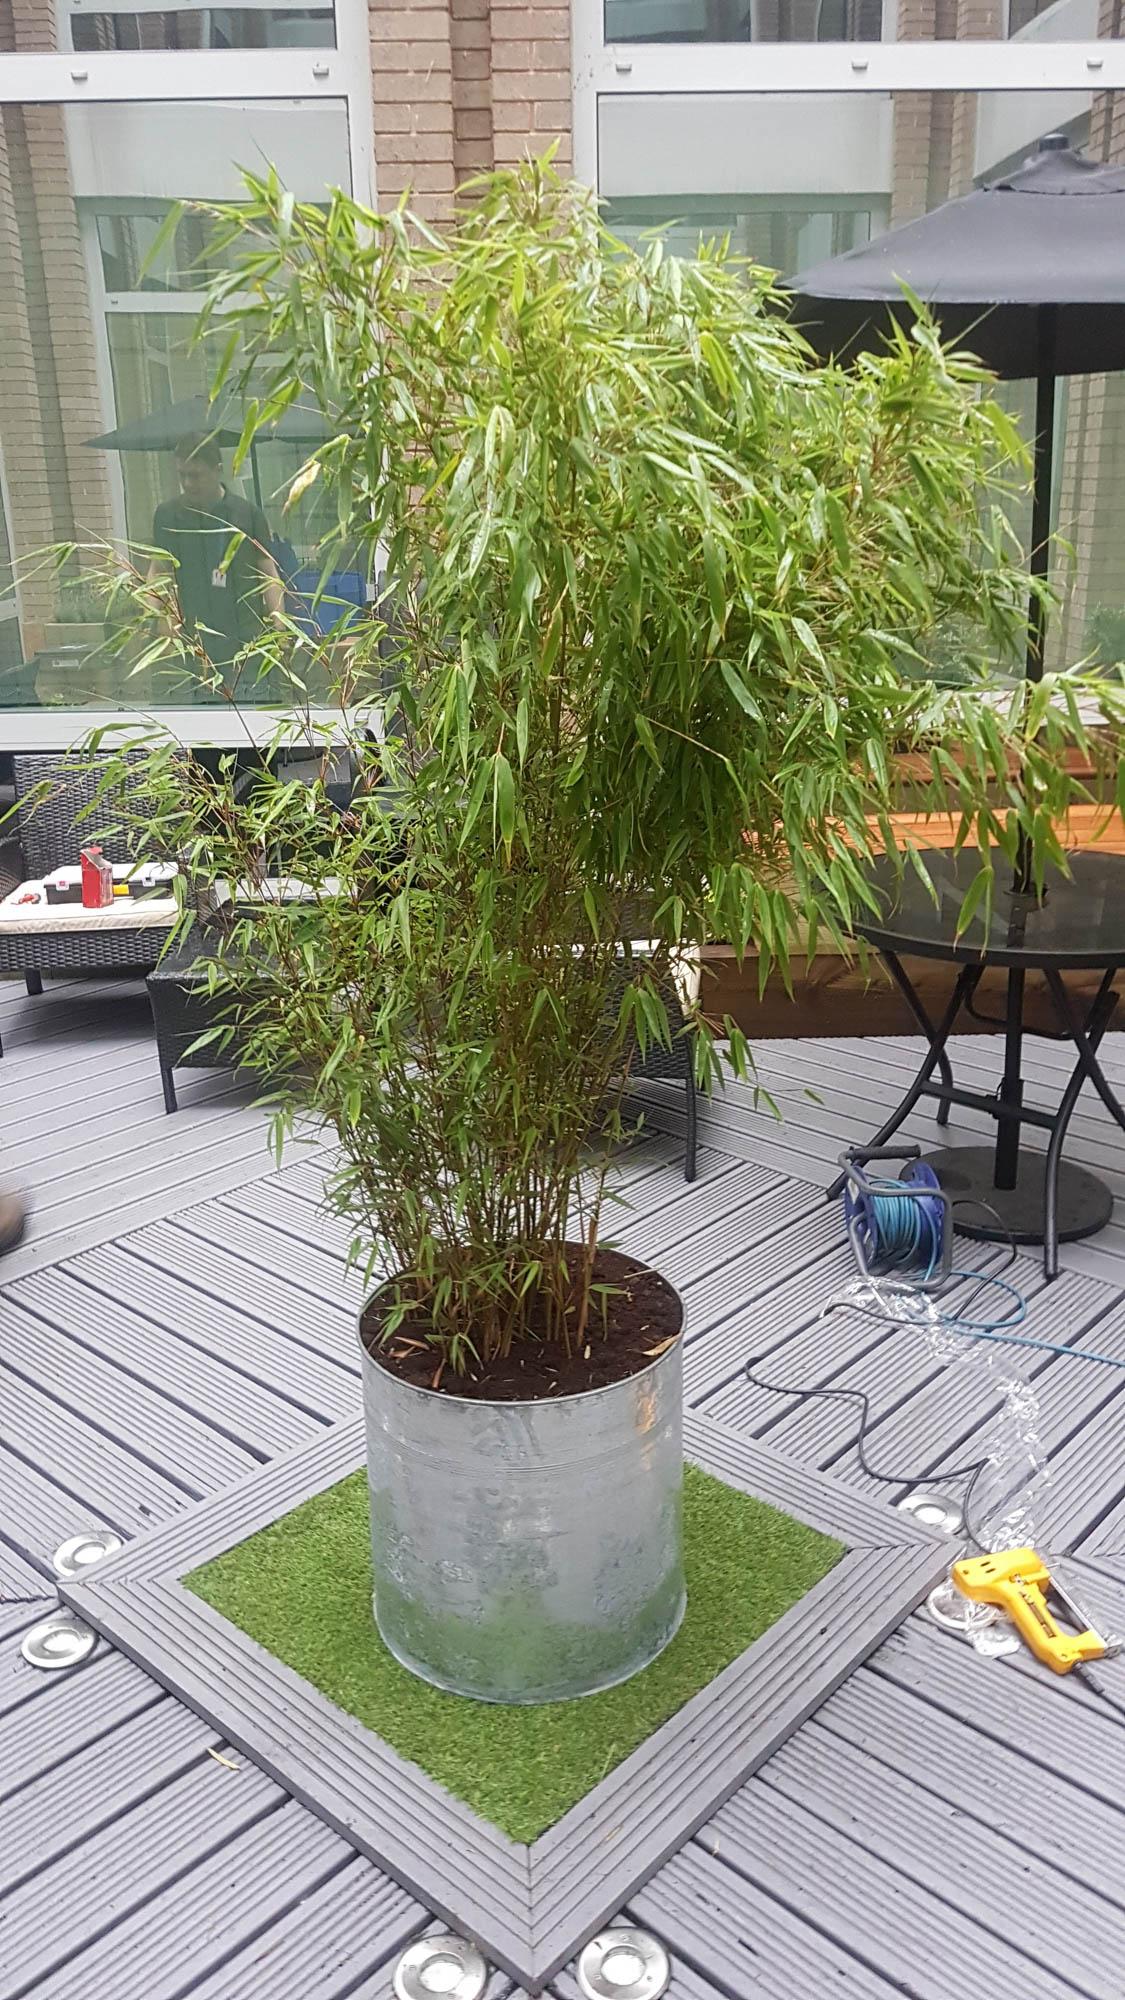 bristol-computer-society-exterior-plant-displays-plantcare-image-2